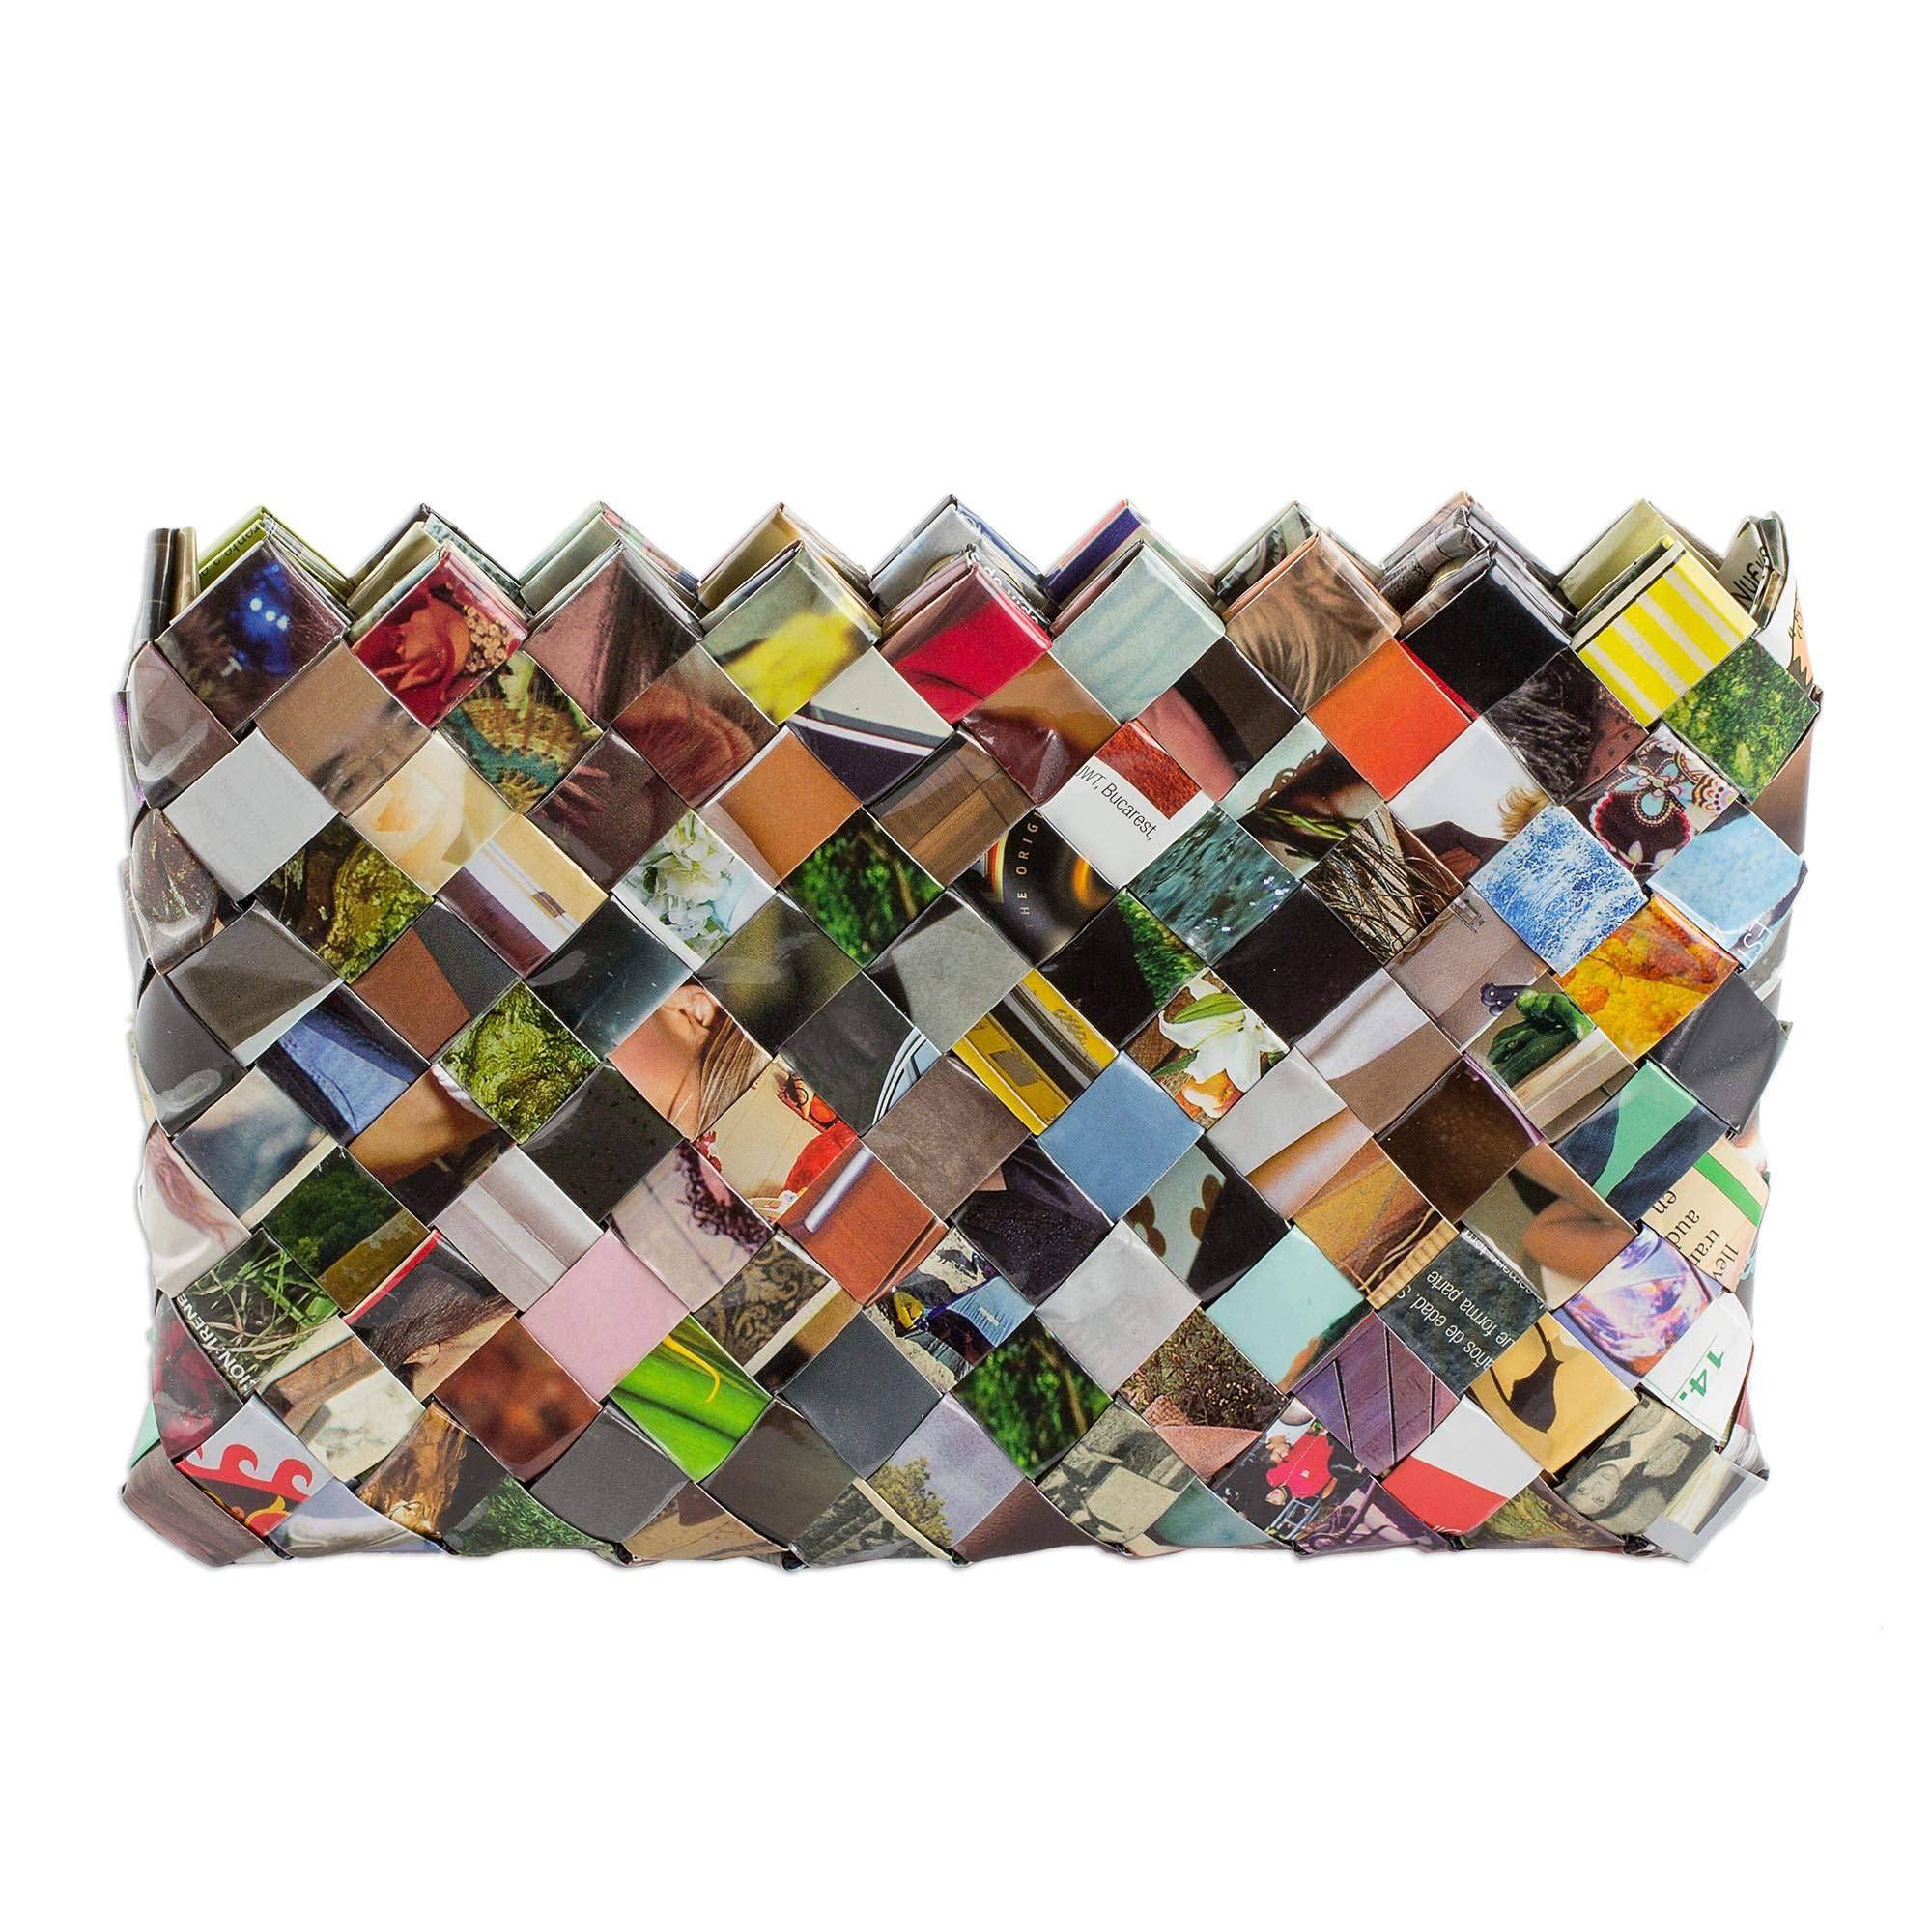 NOVICA Multicolor Recycled Magazine Clutch Bag, Fashion Fiesta' (6 inch)